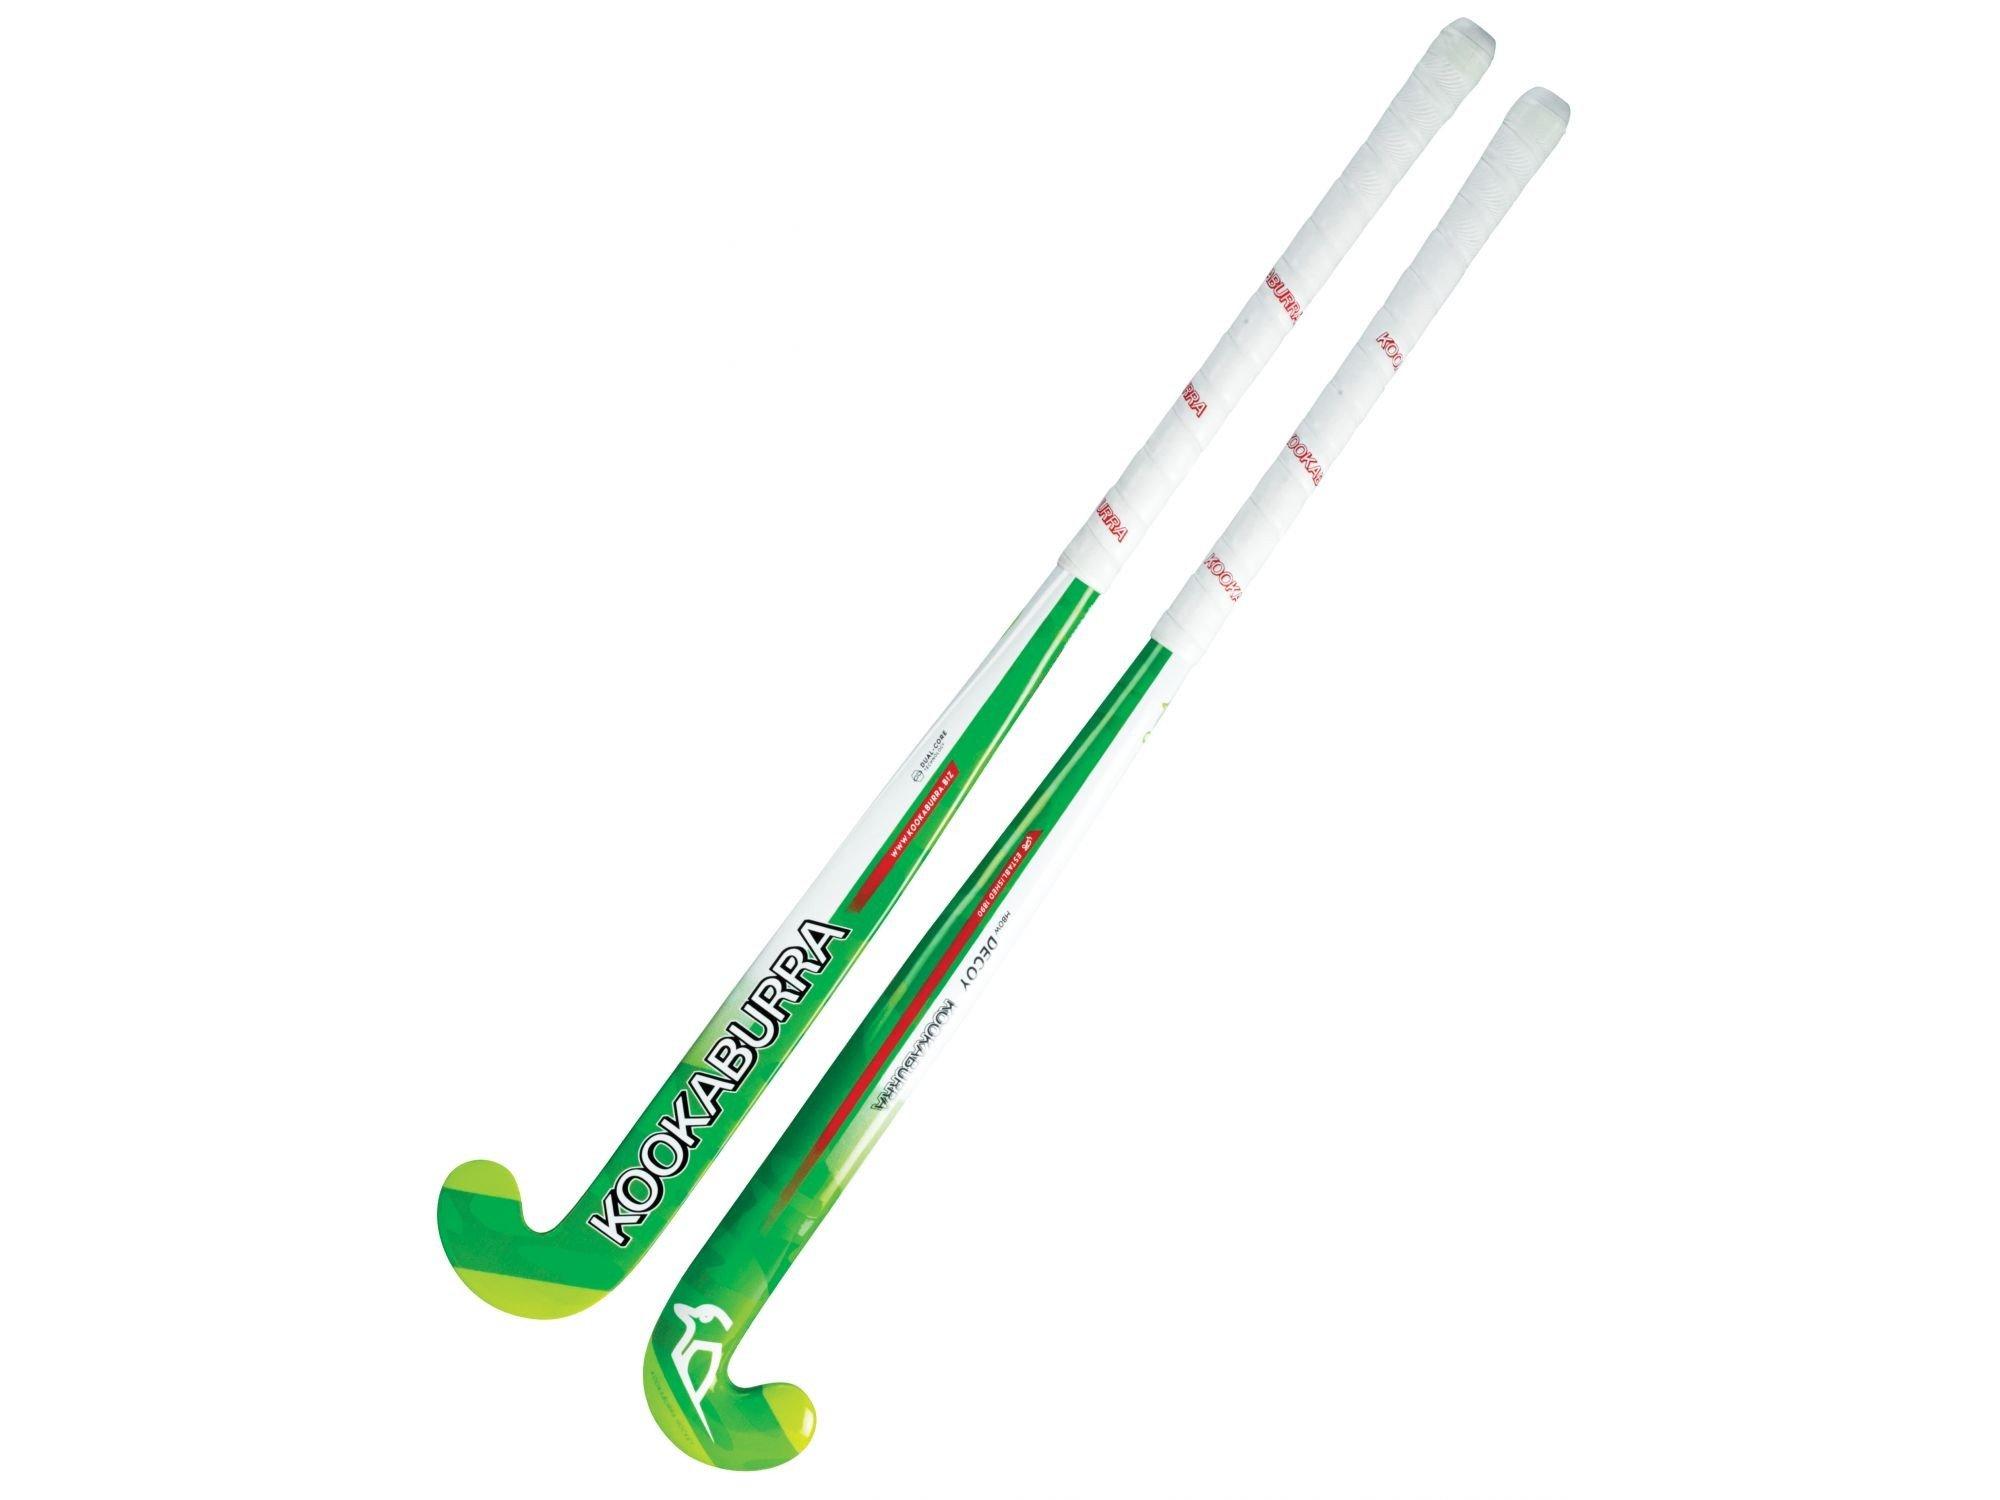 2016/17 Kookaburra Decoy - Mbow Junior Hockey Stick